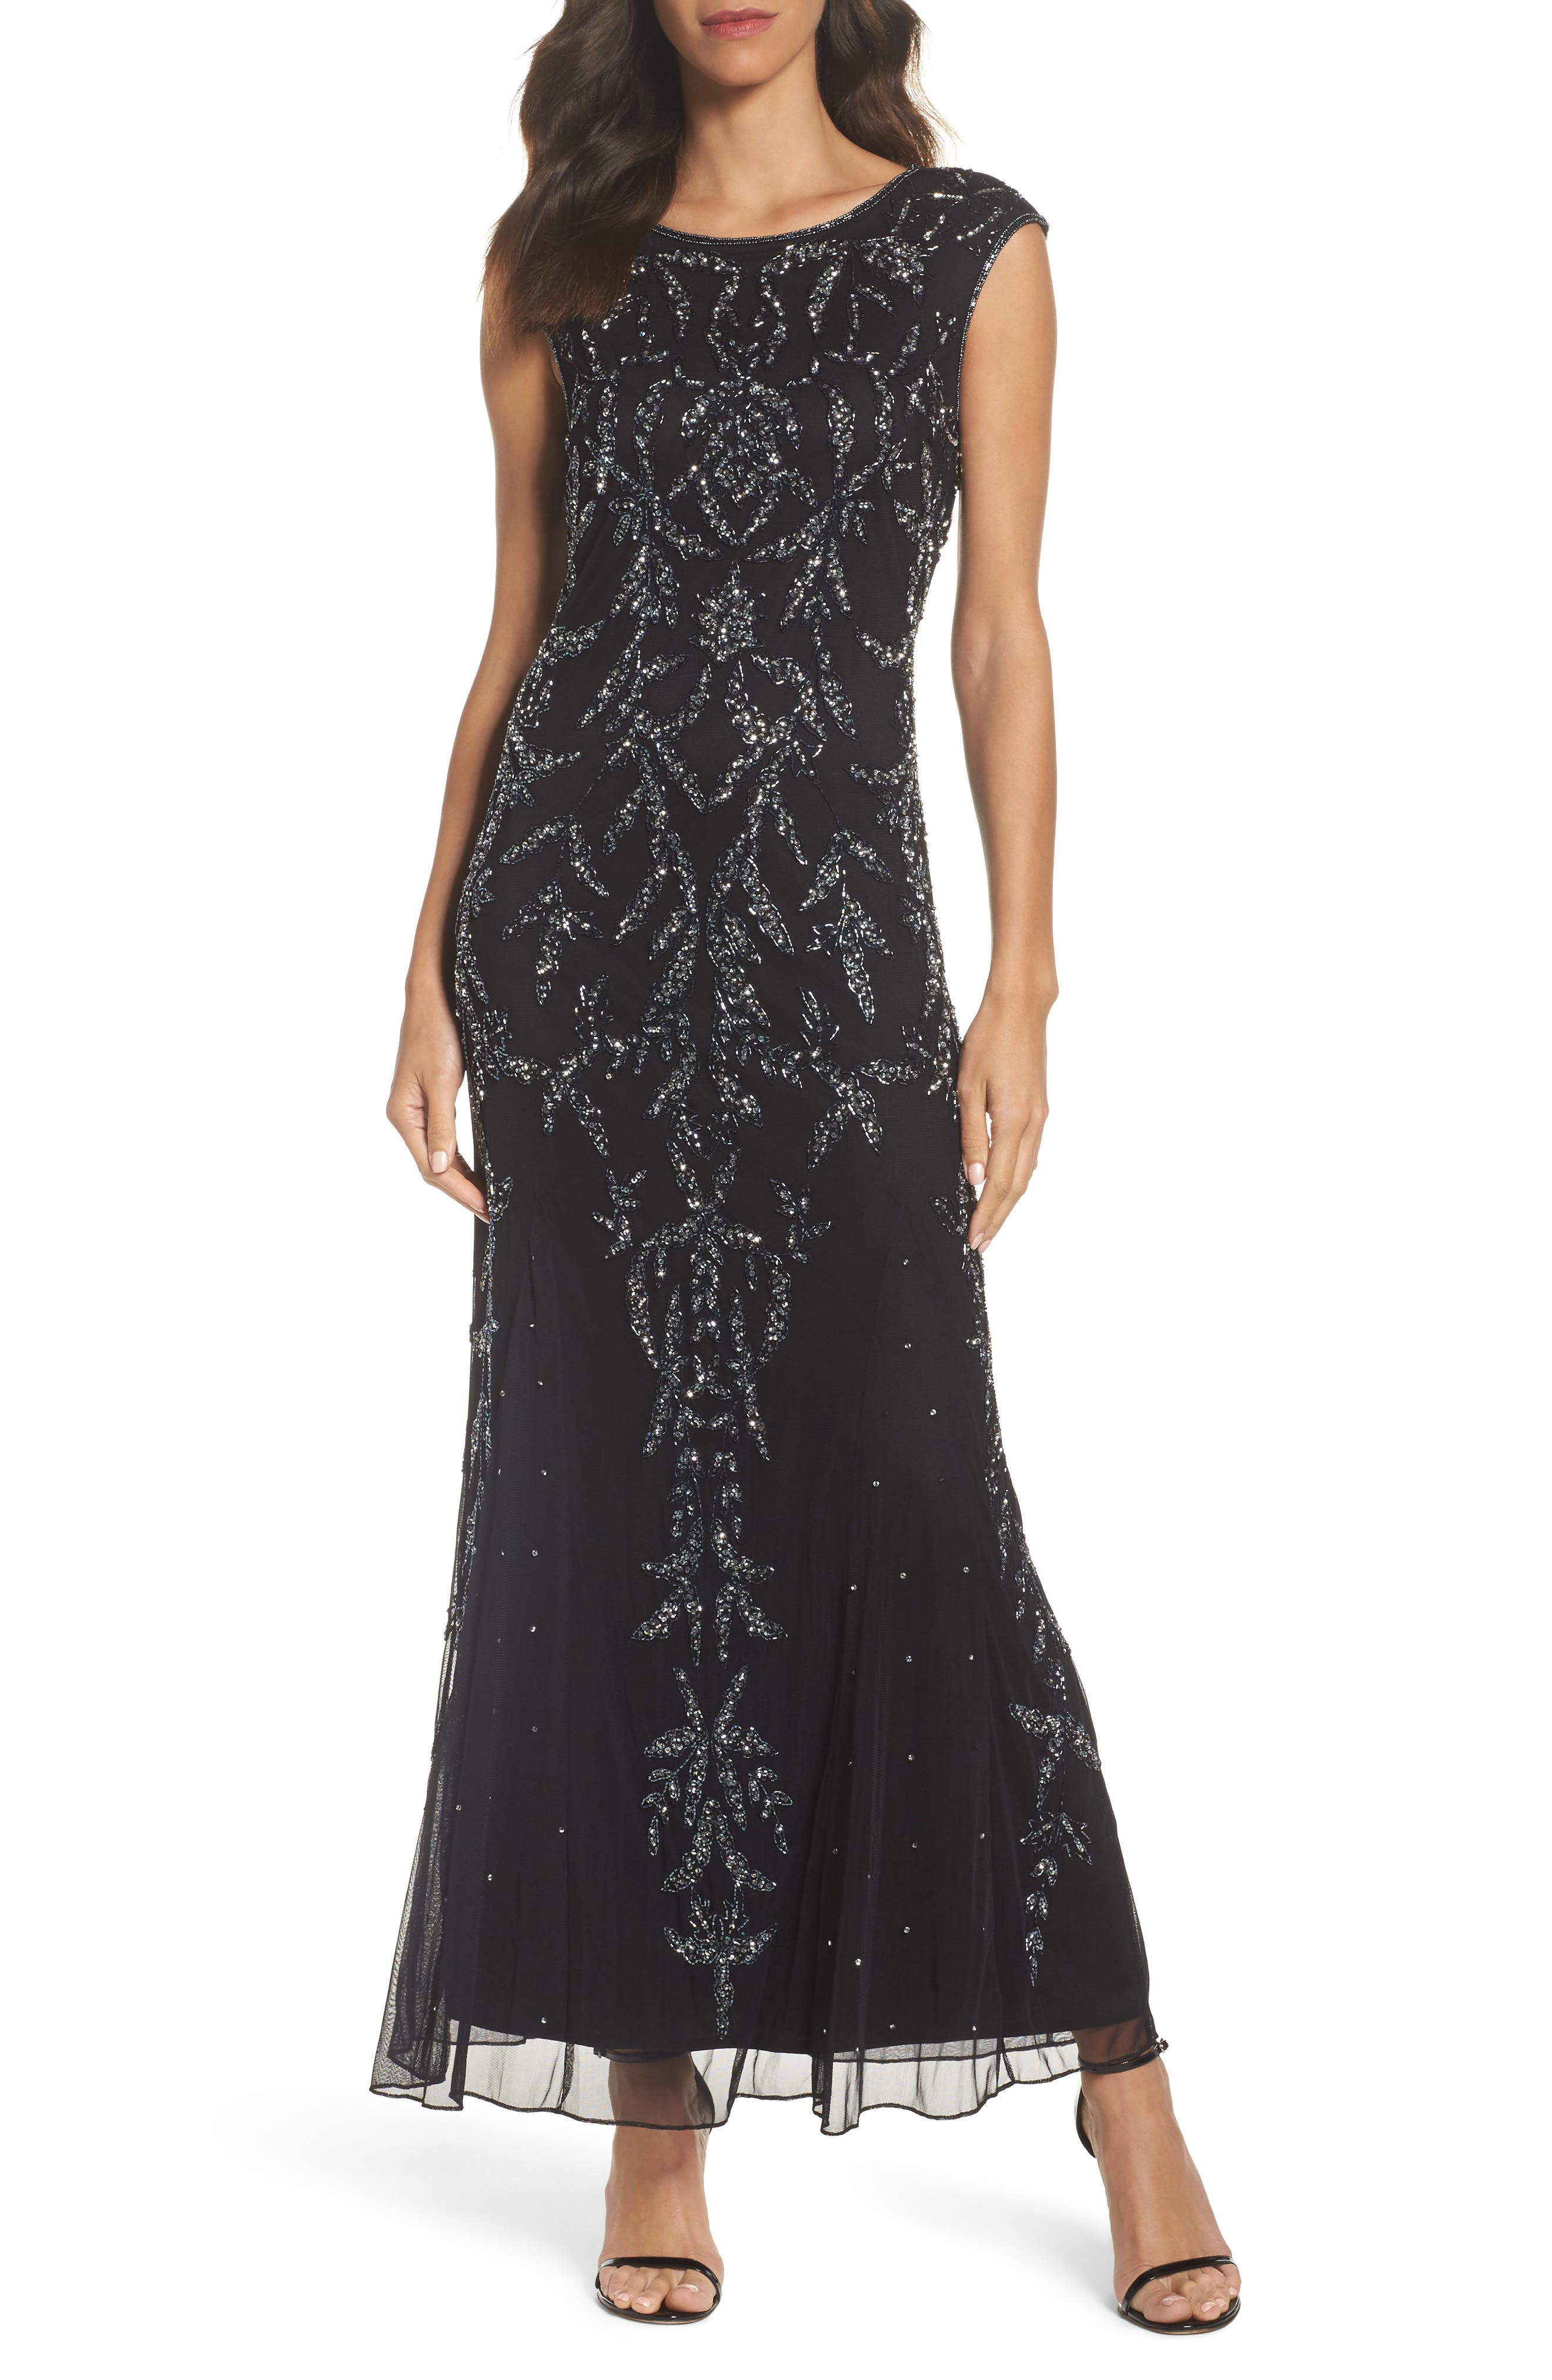 Pisarro Nights Floral Motif Embellished Gown